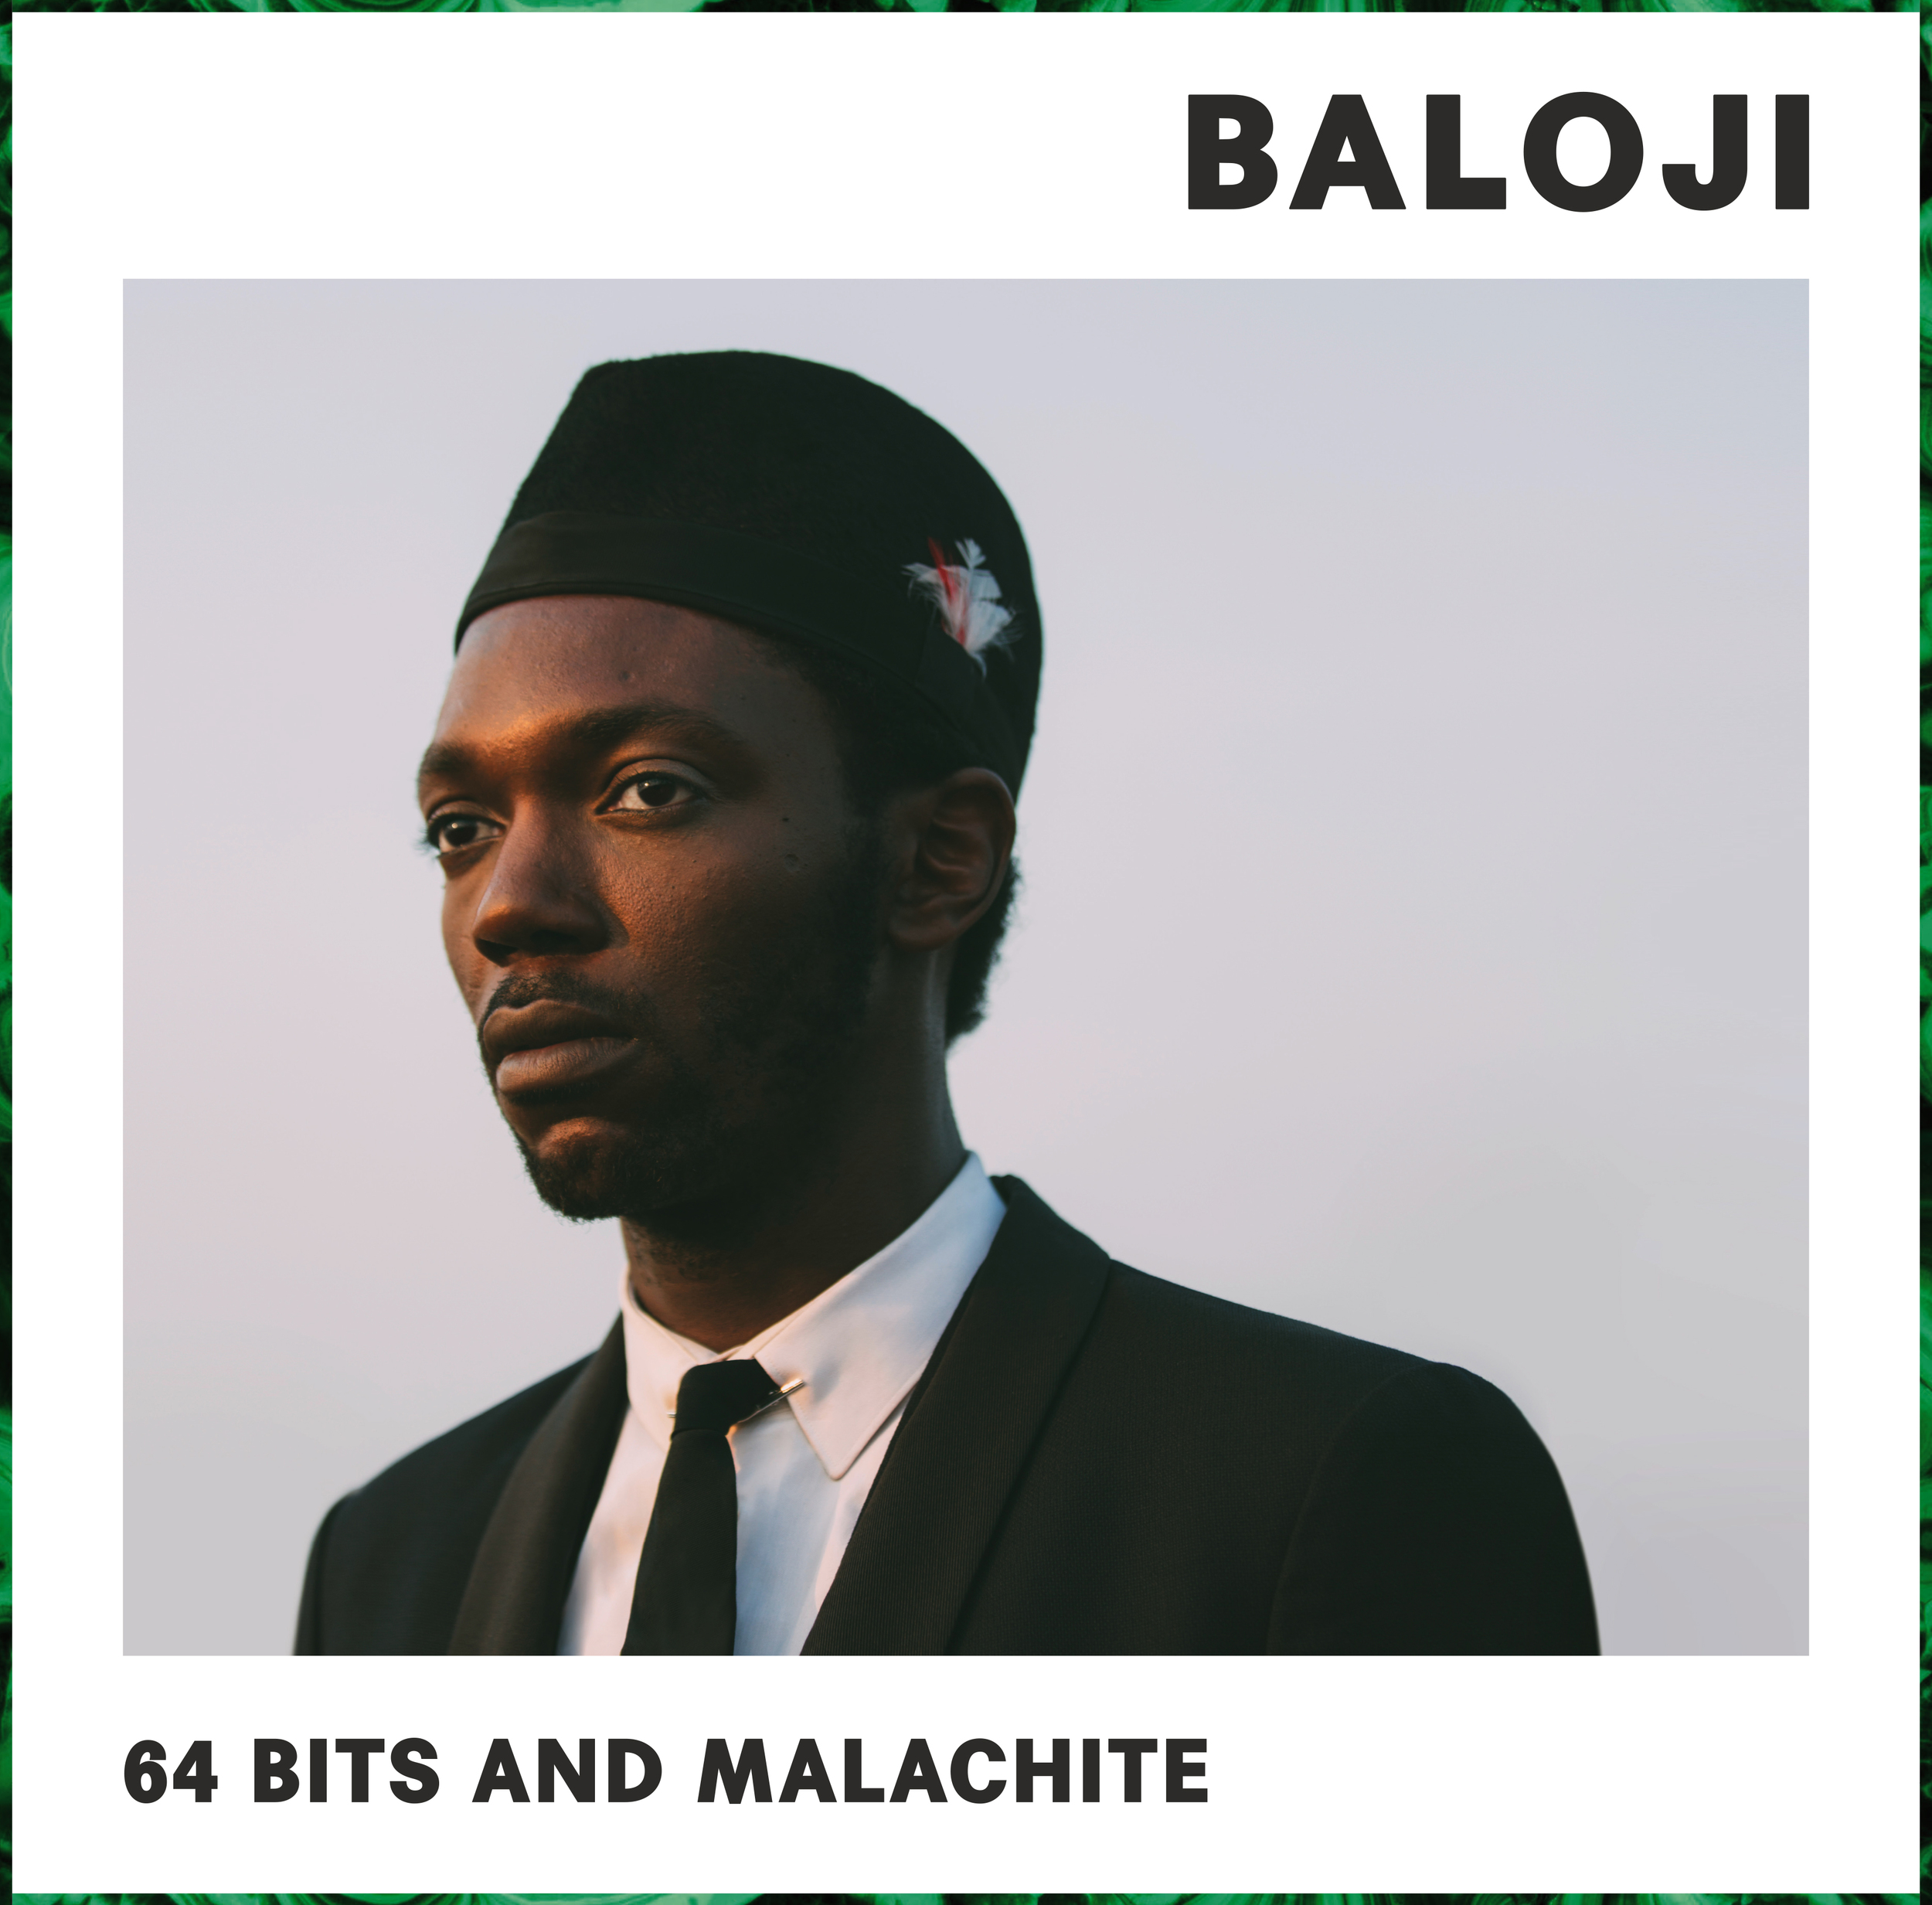 Cover Art : Baloji